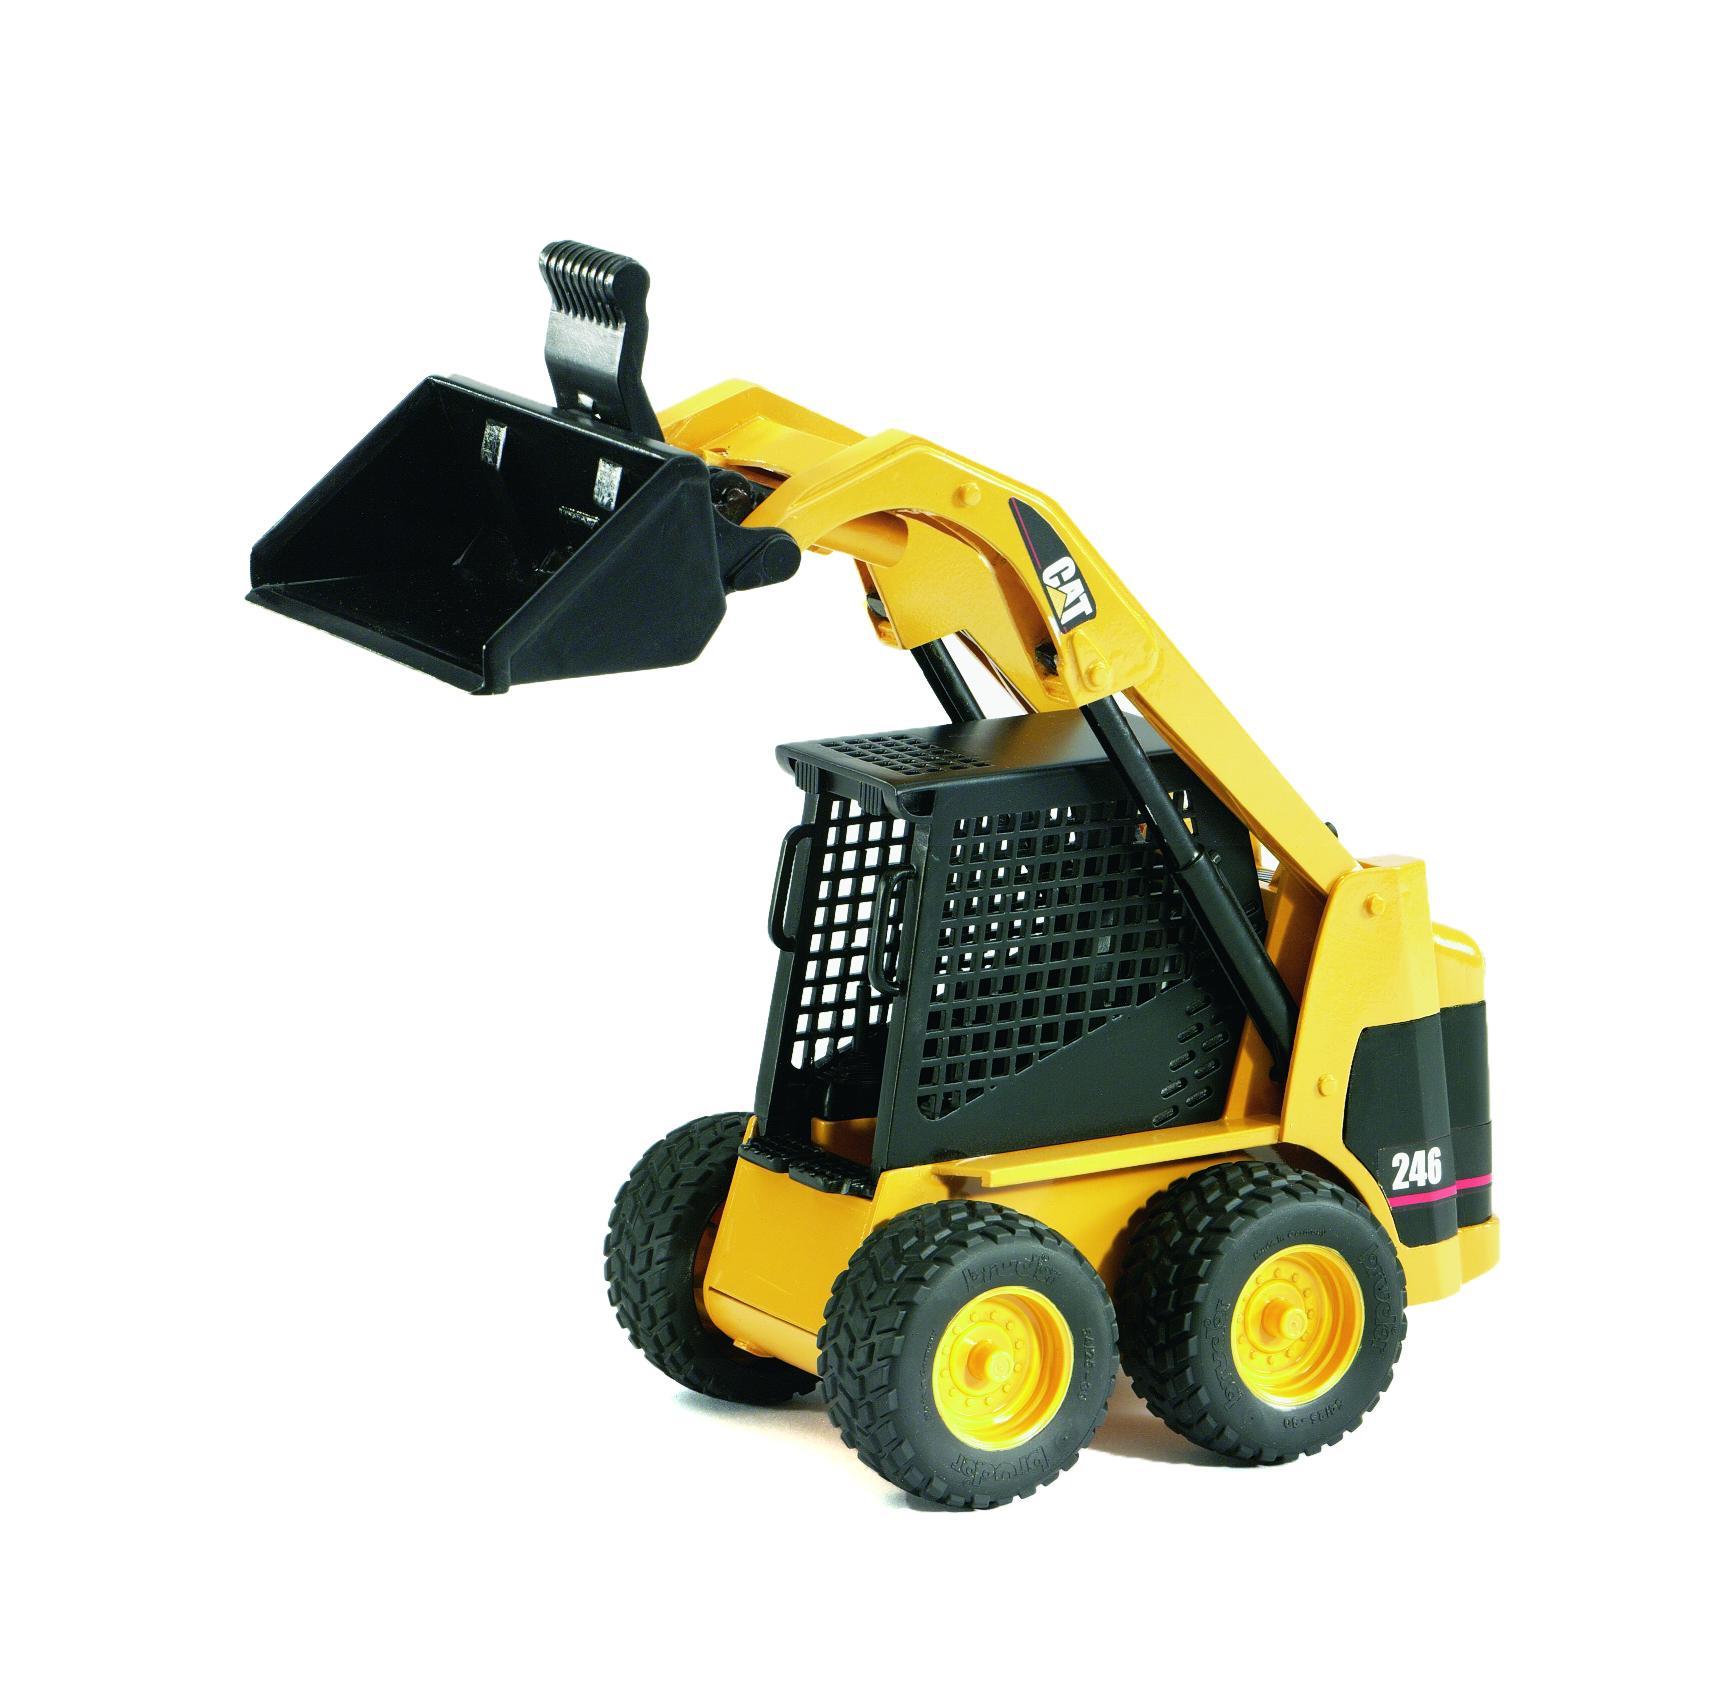 Cat Skid Steer : Amazon bruder cat skid steer loader toys games